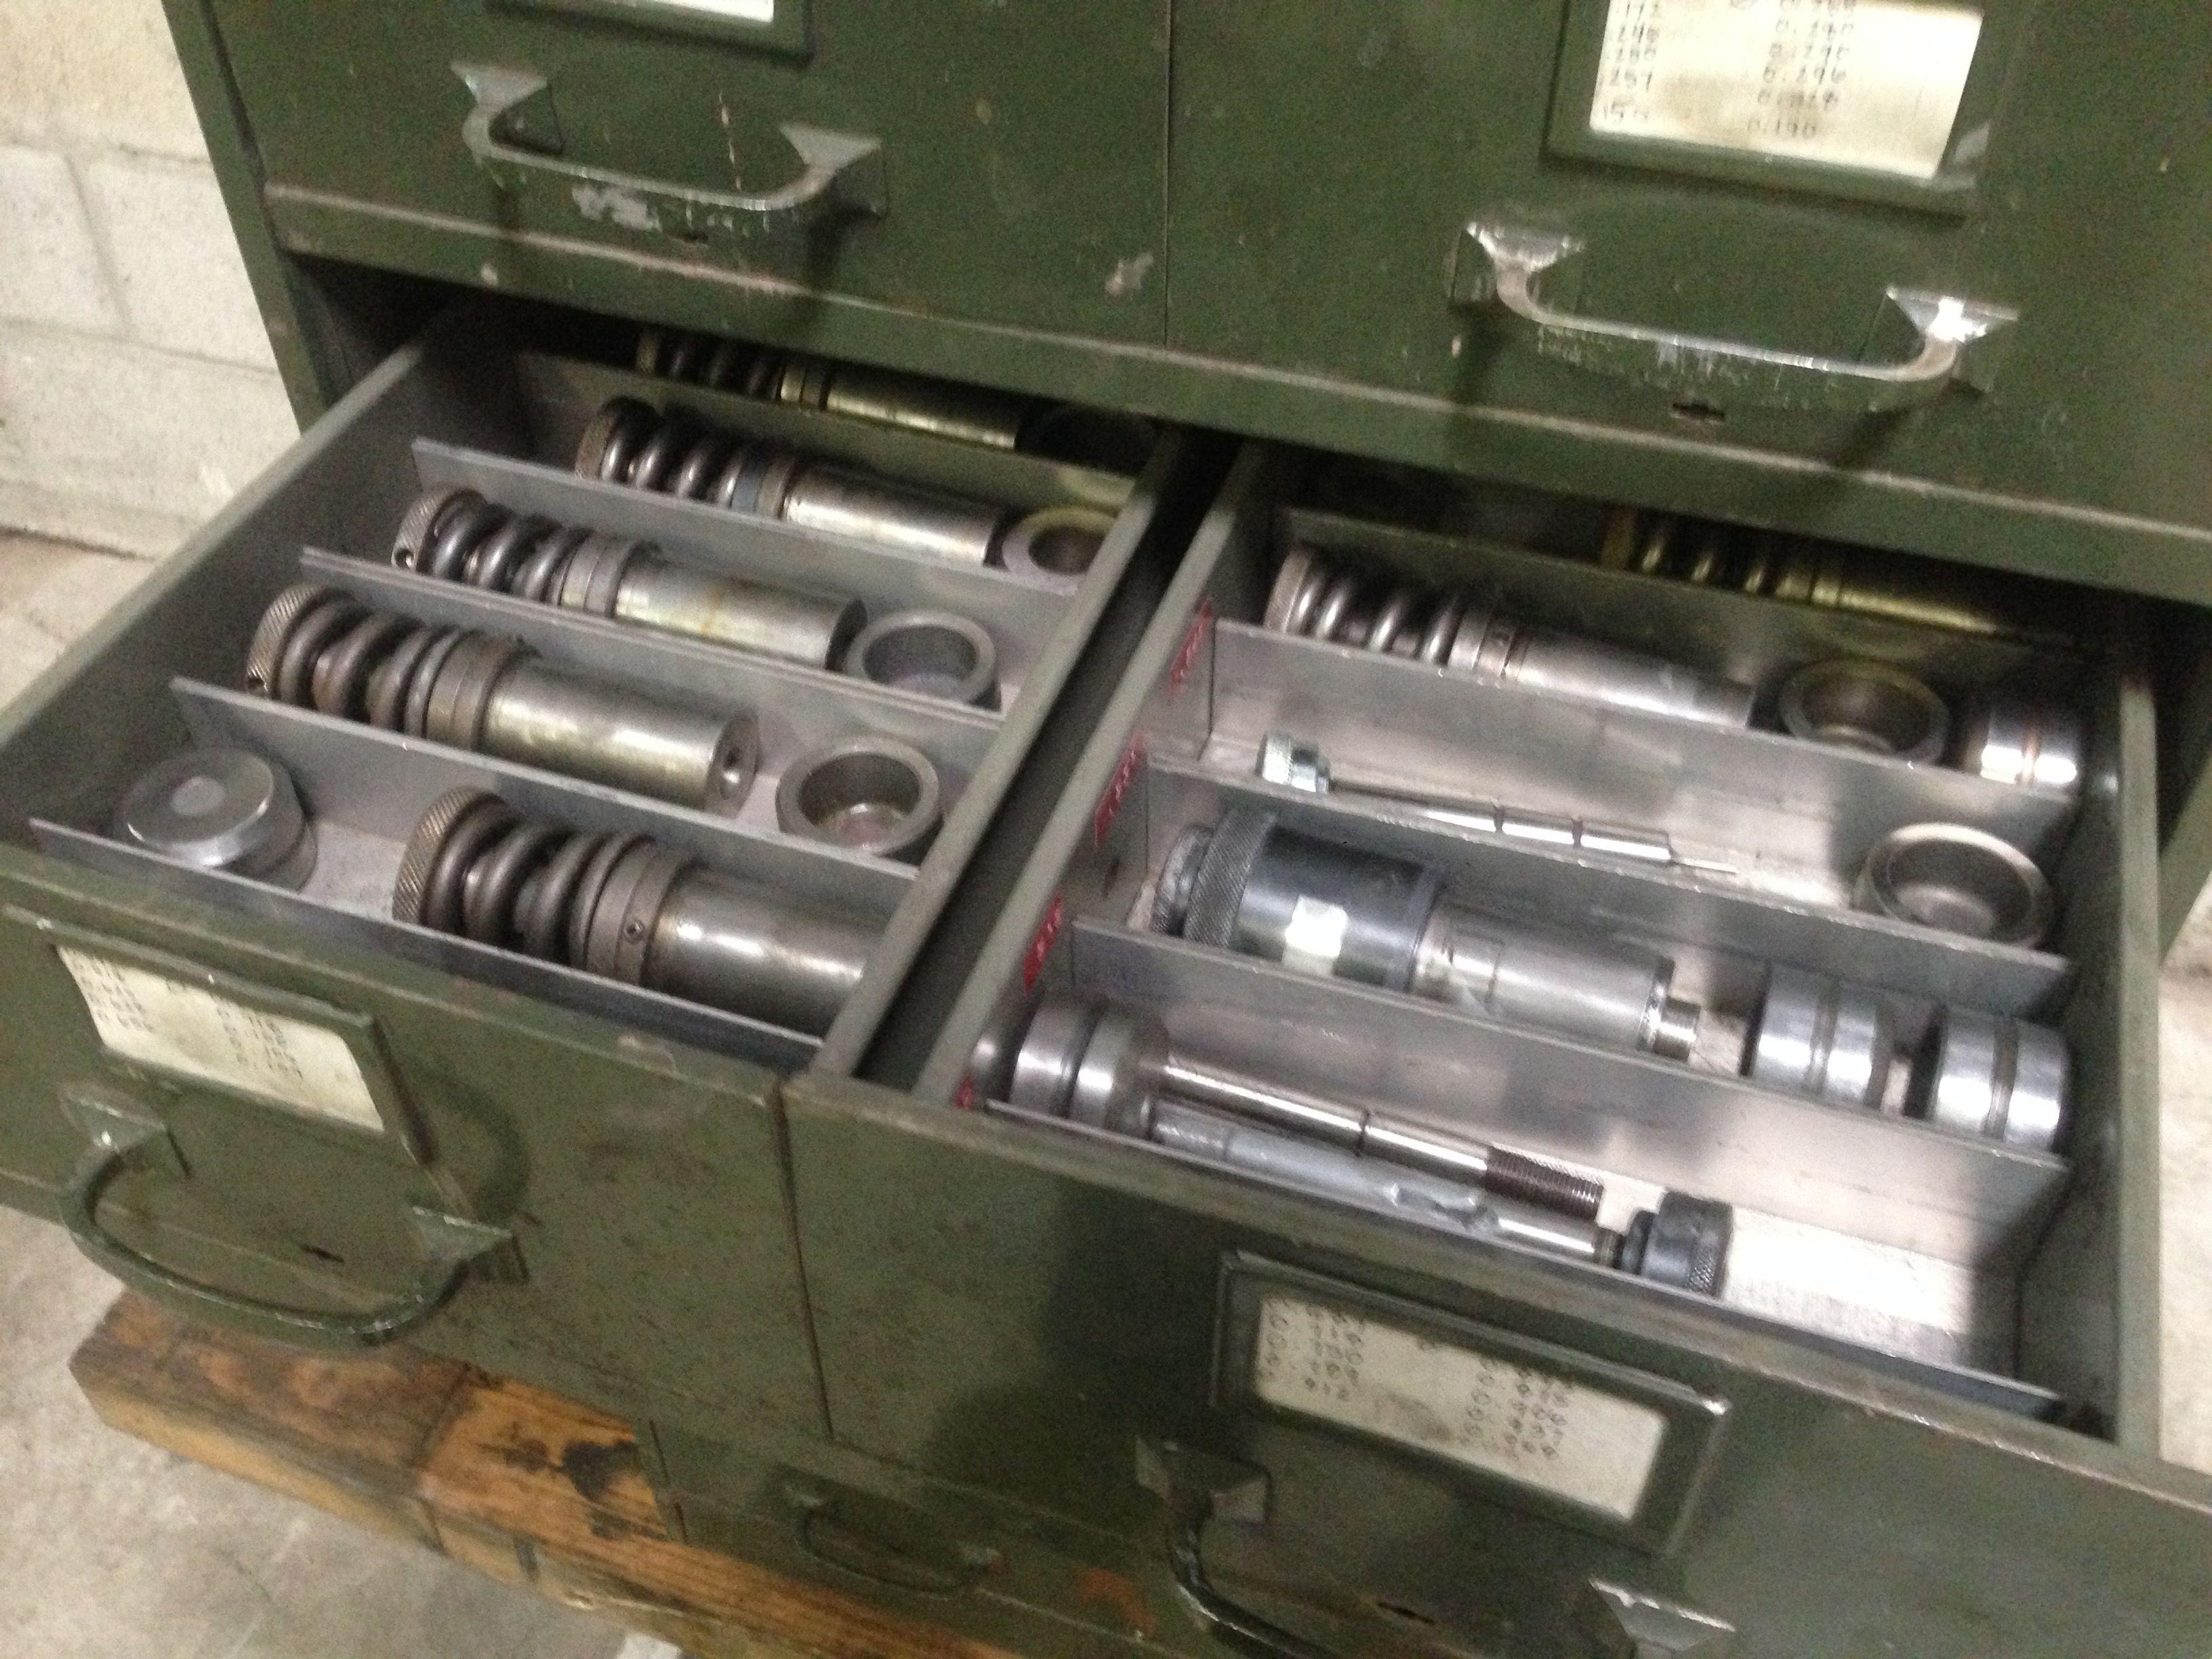 Pin by enzo gangeri on productos kitchen appliances